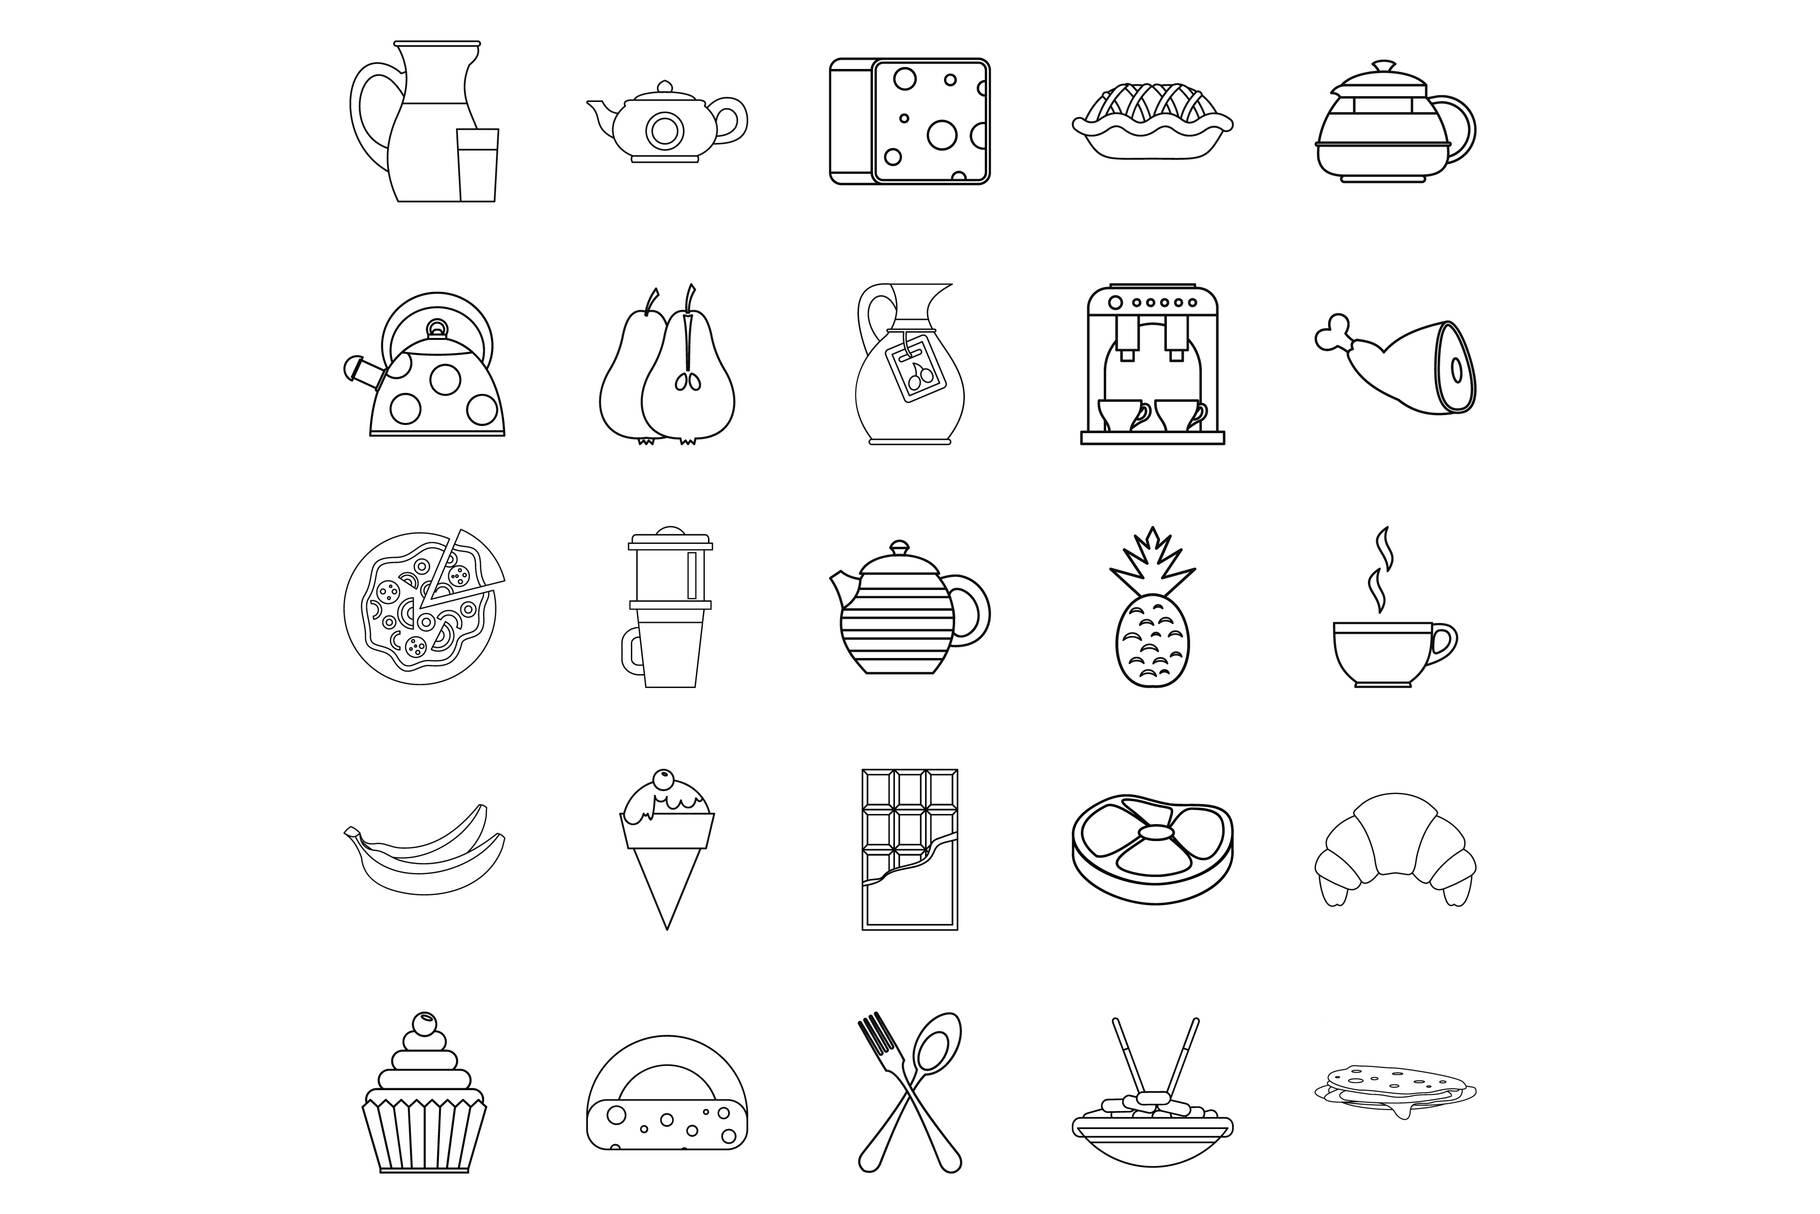 Feeding icons set, outline style example image 1